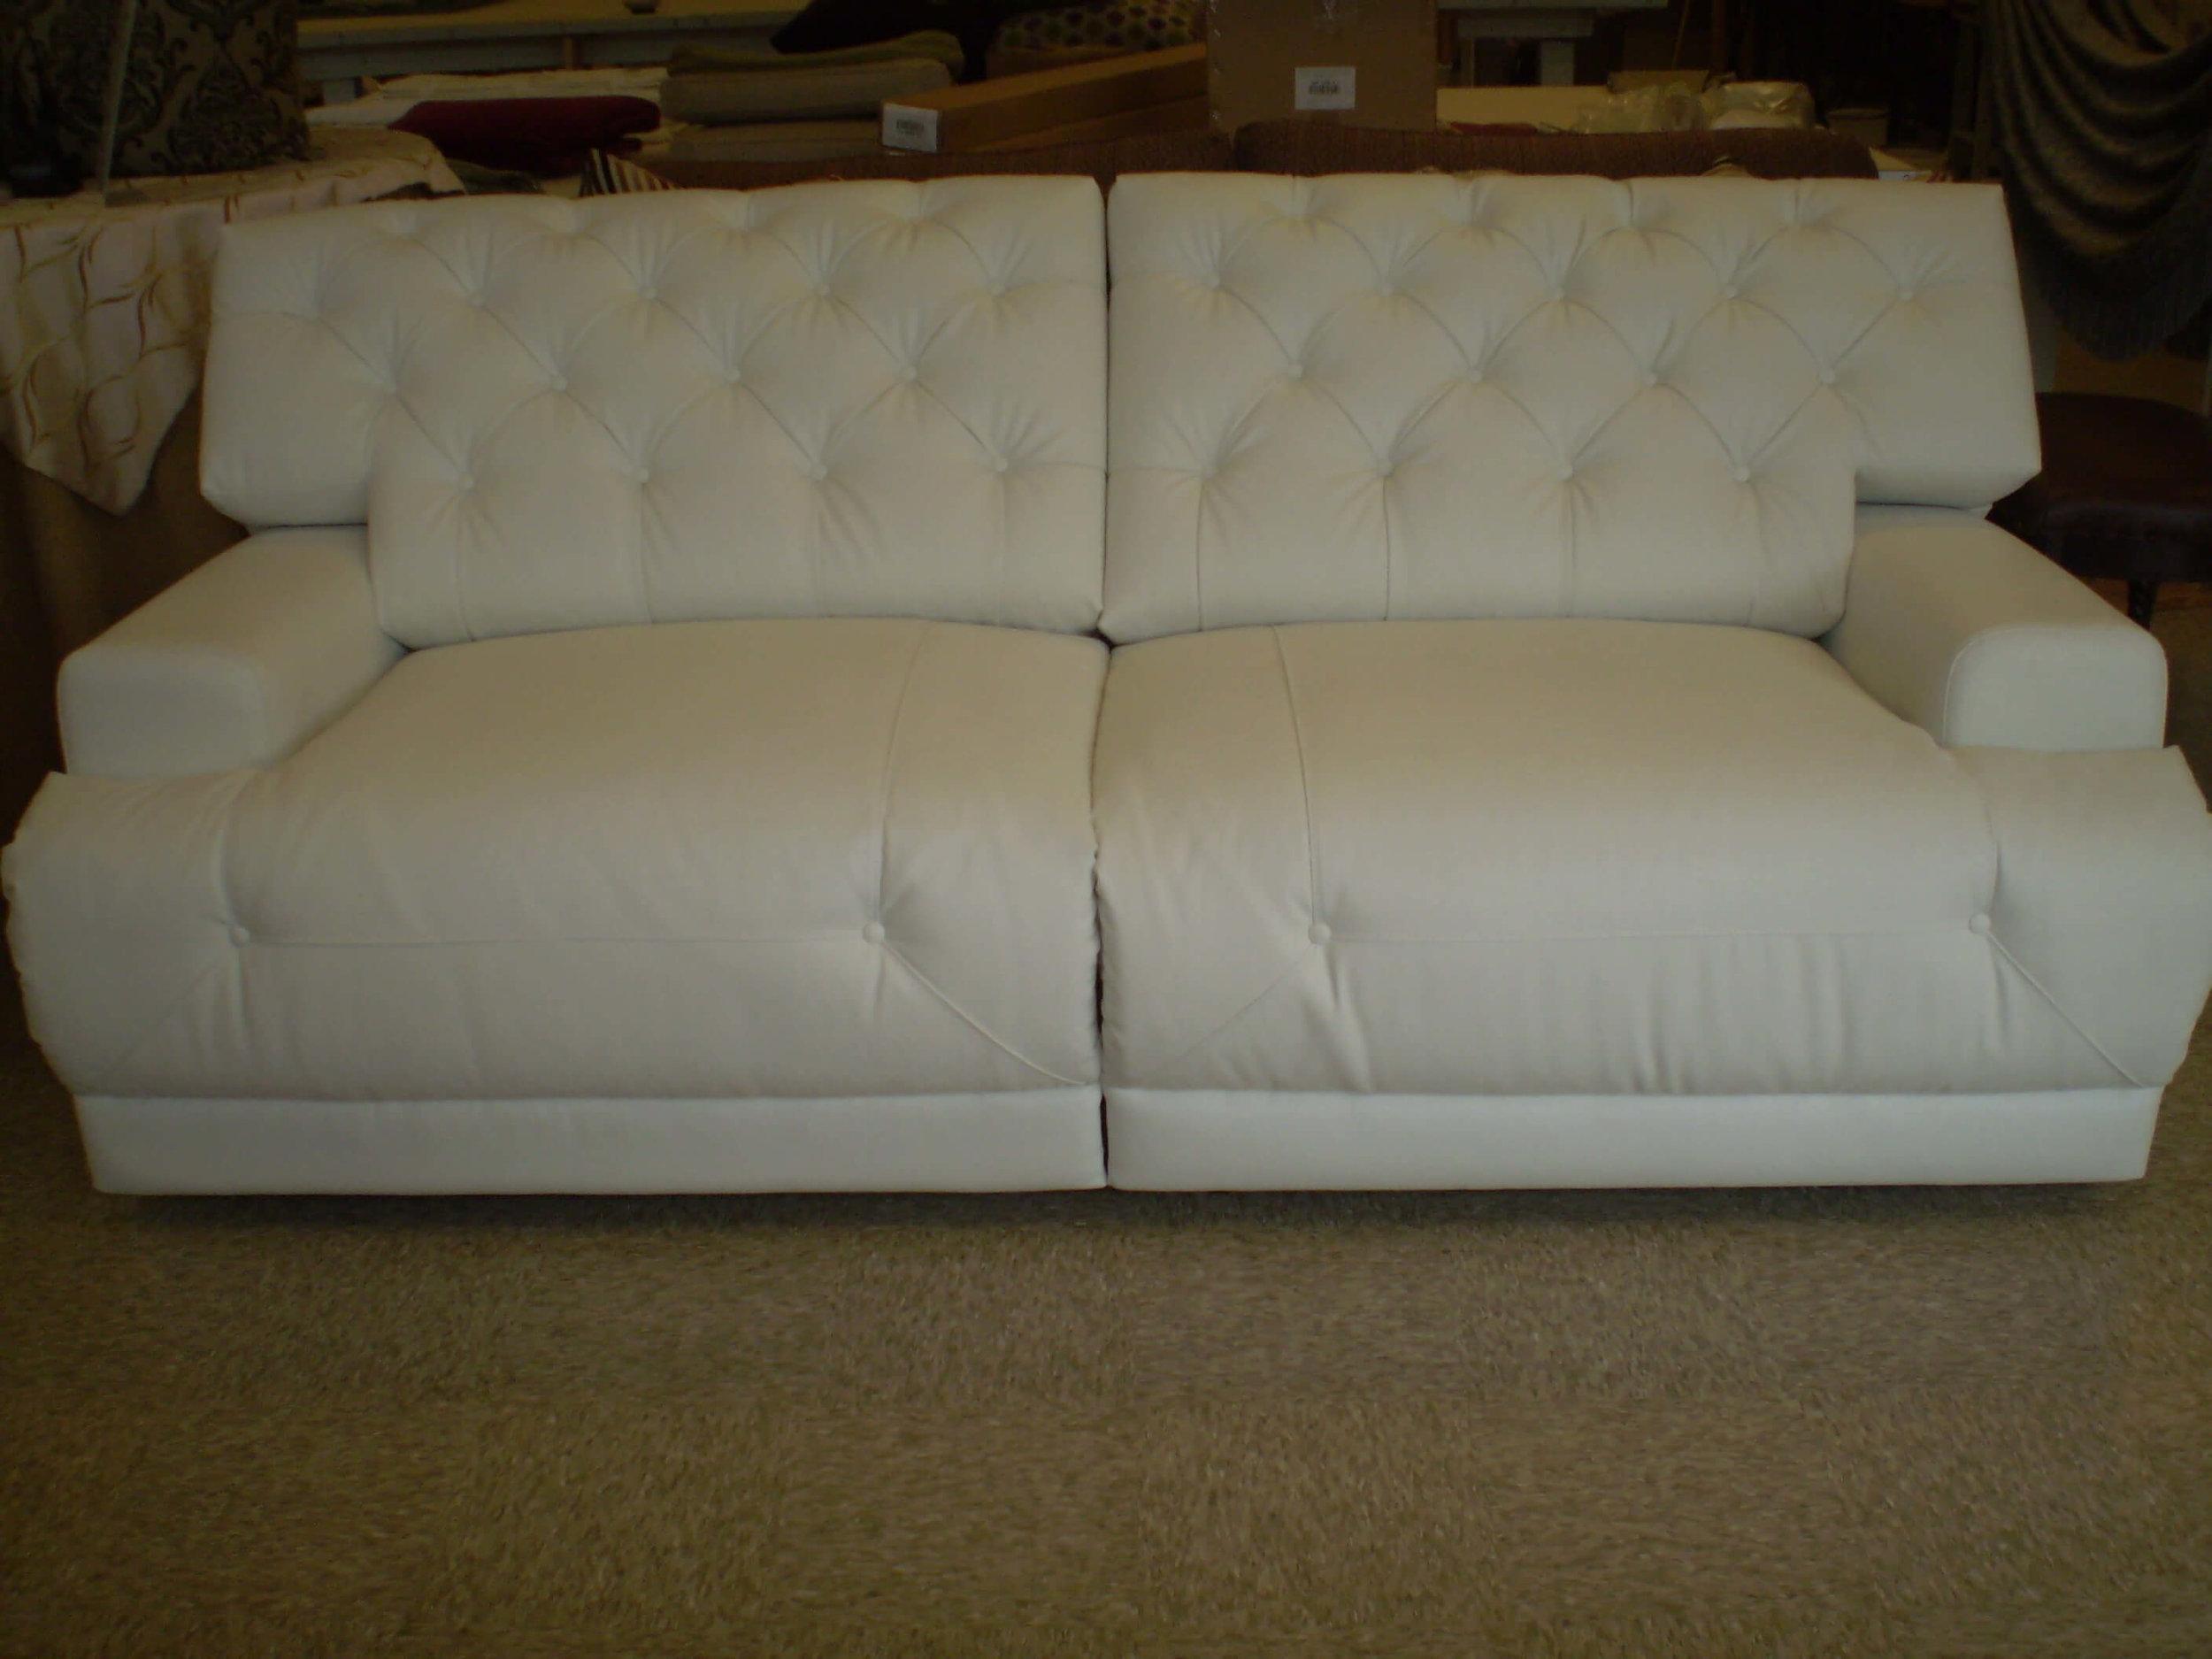 custom-furniture-upholstery-design-atlanta-georgia-8.JPG